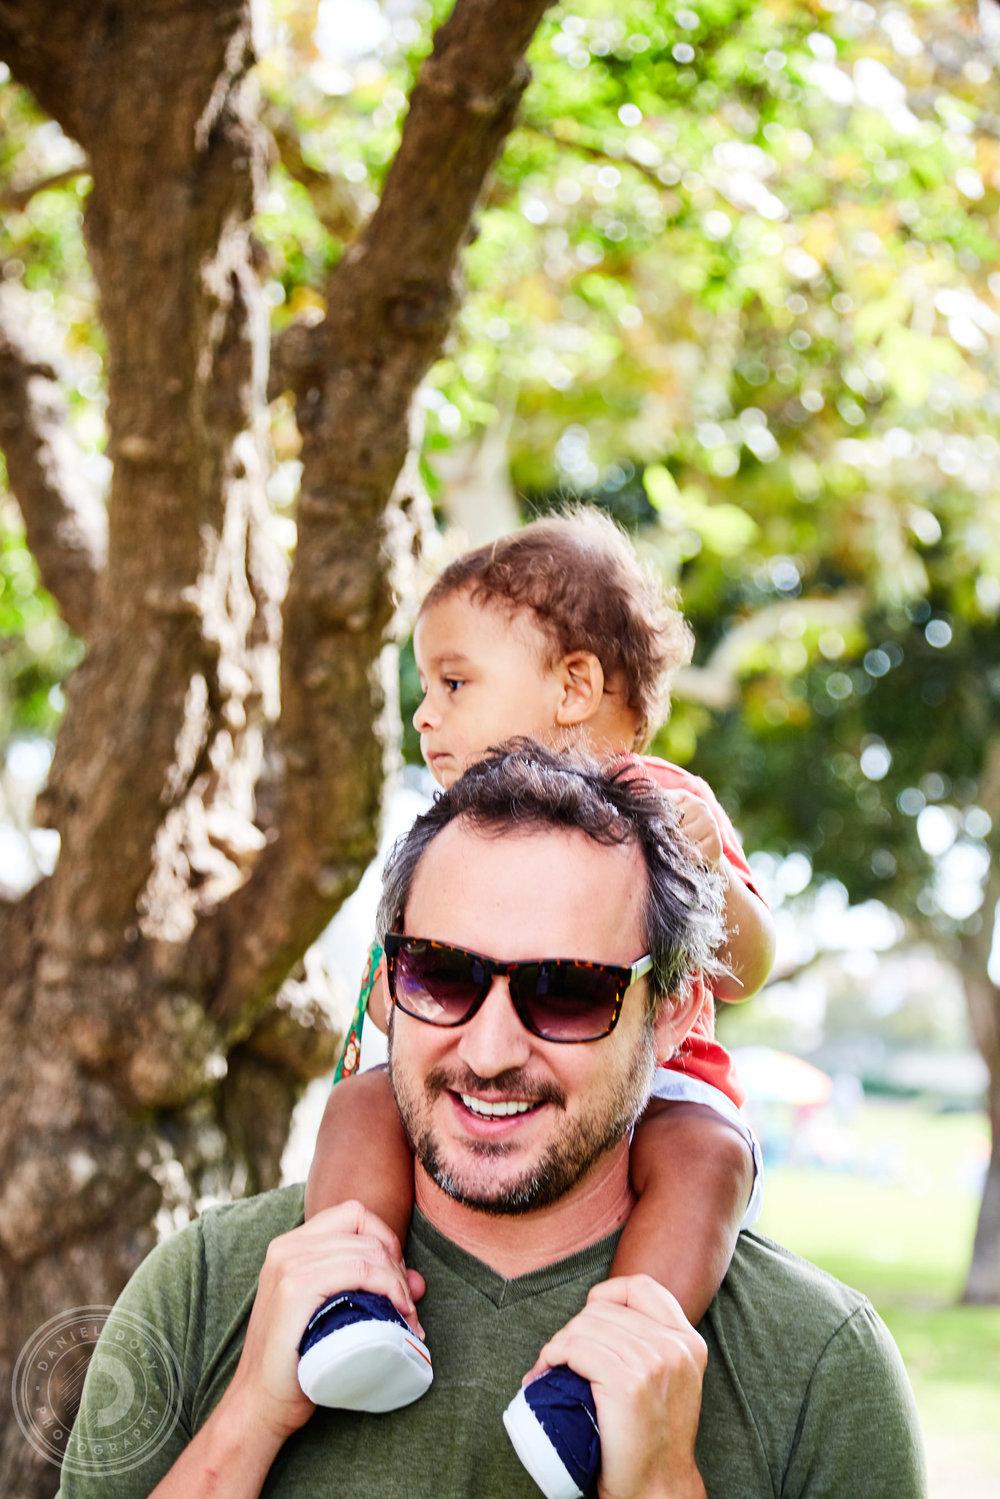 Valley Park Hermosa Beach 1st Birthday Photography Daniel Doty Photography 110.jpg